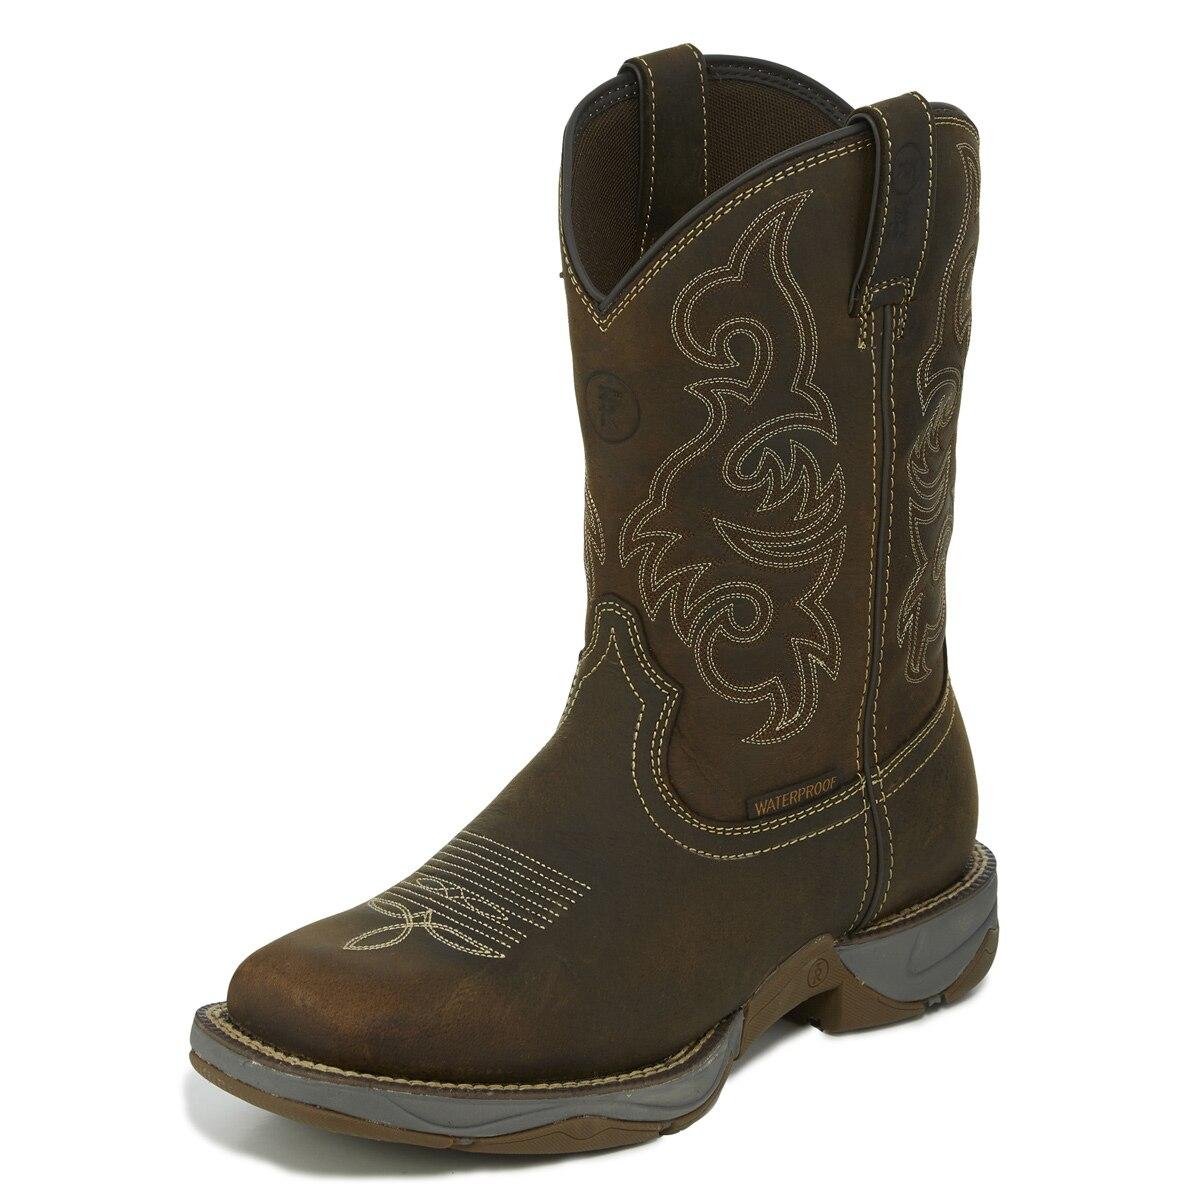 Tony Lama Men's Junction Boot - Waterproof